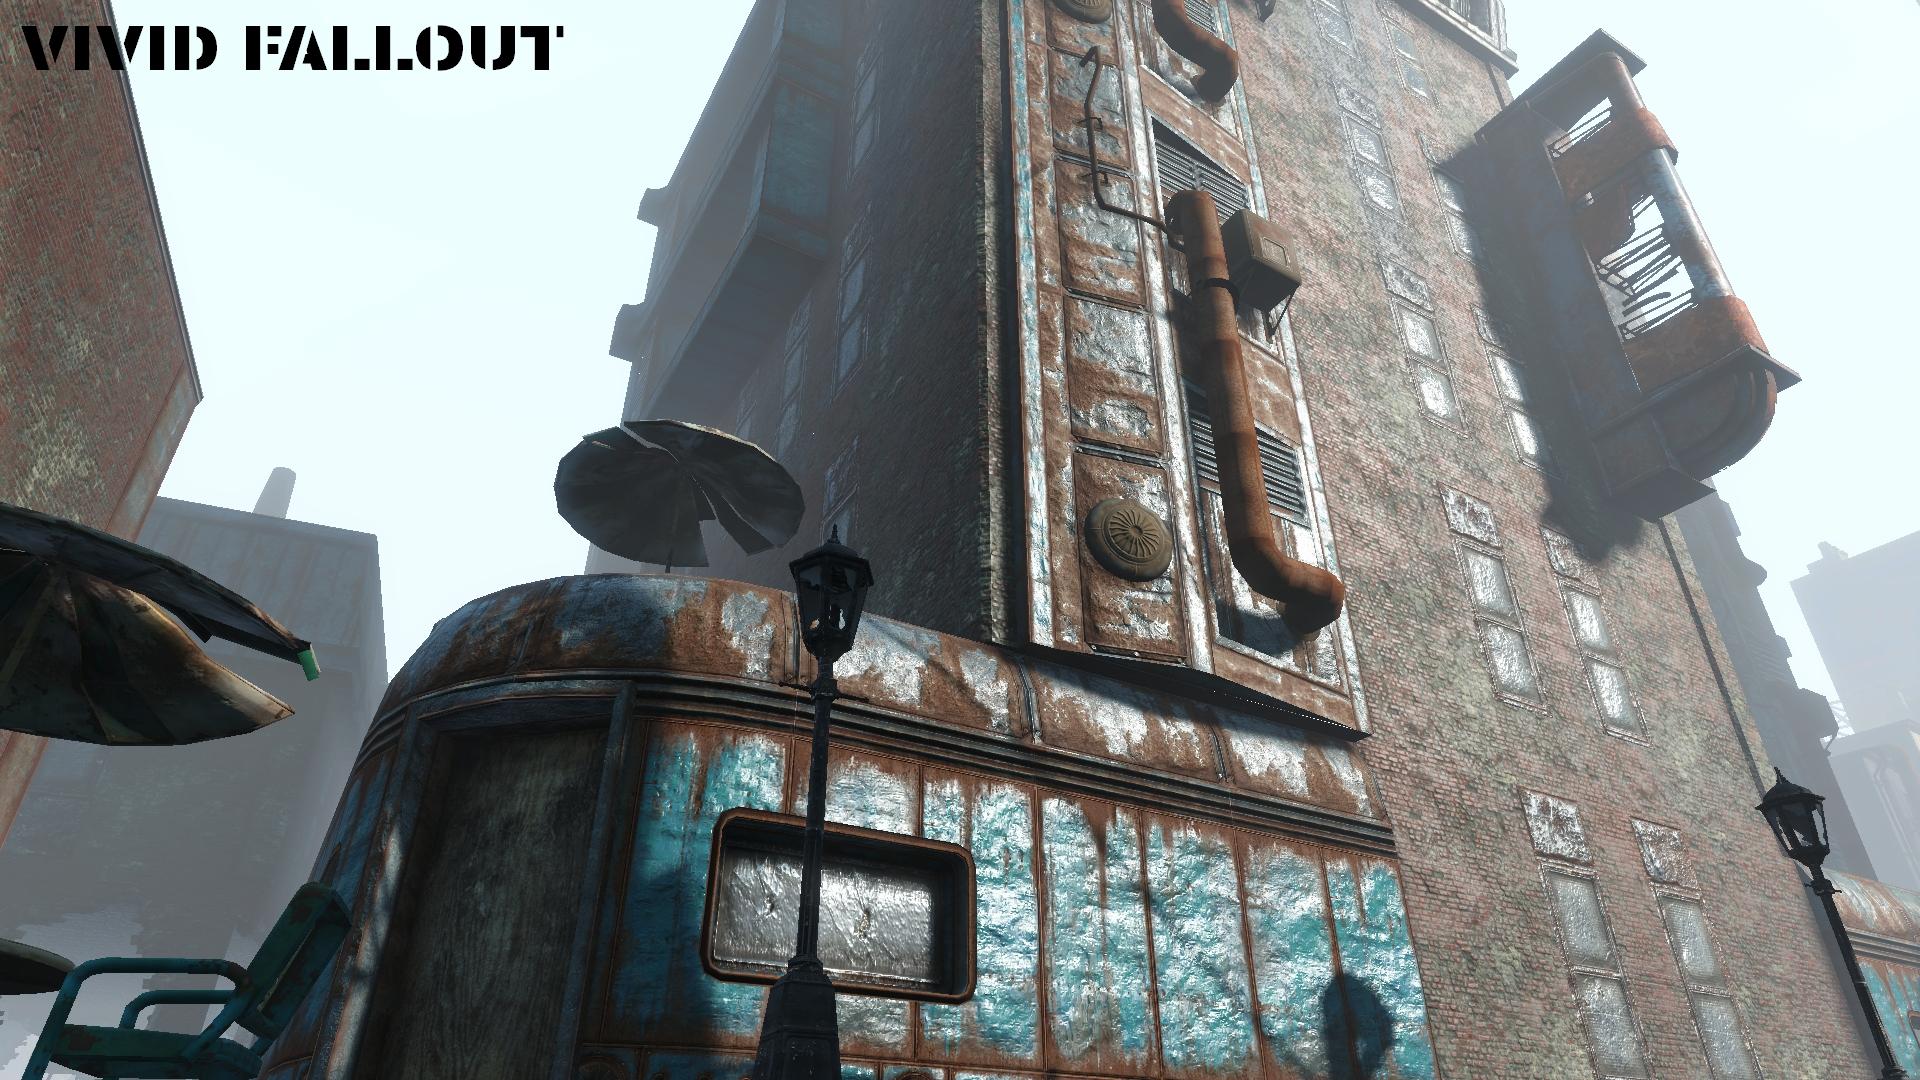 Fallout 3 Mod Pack 2018